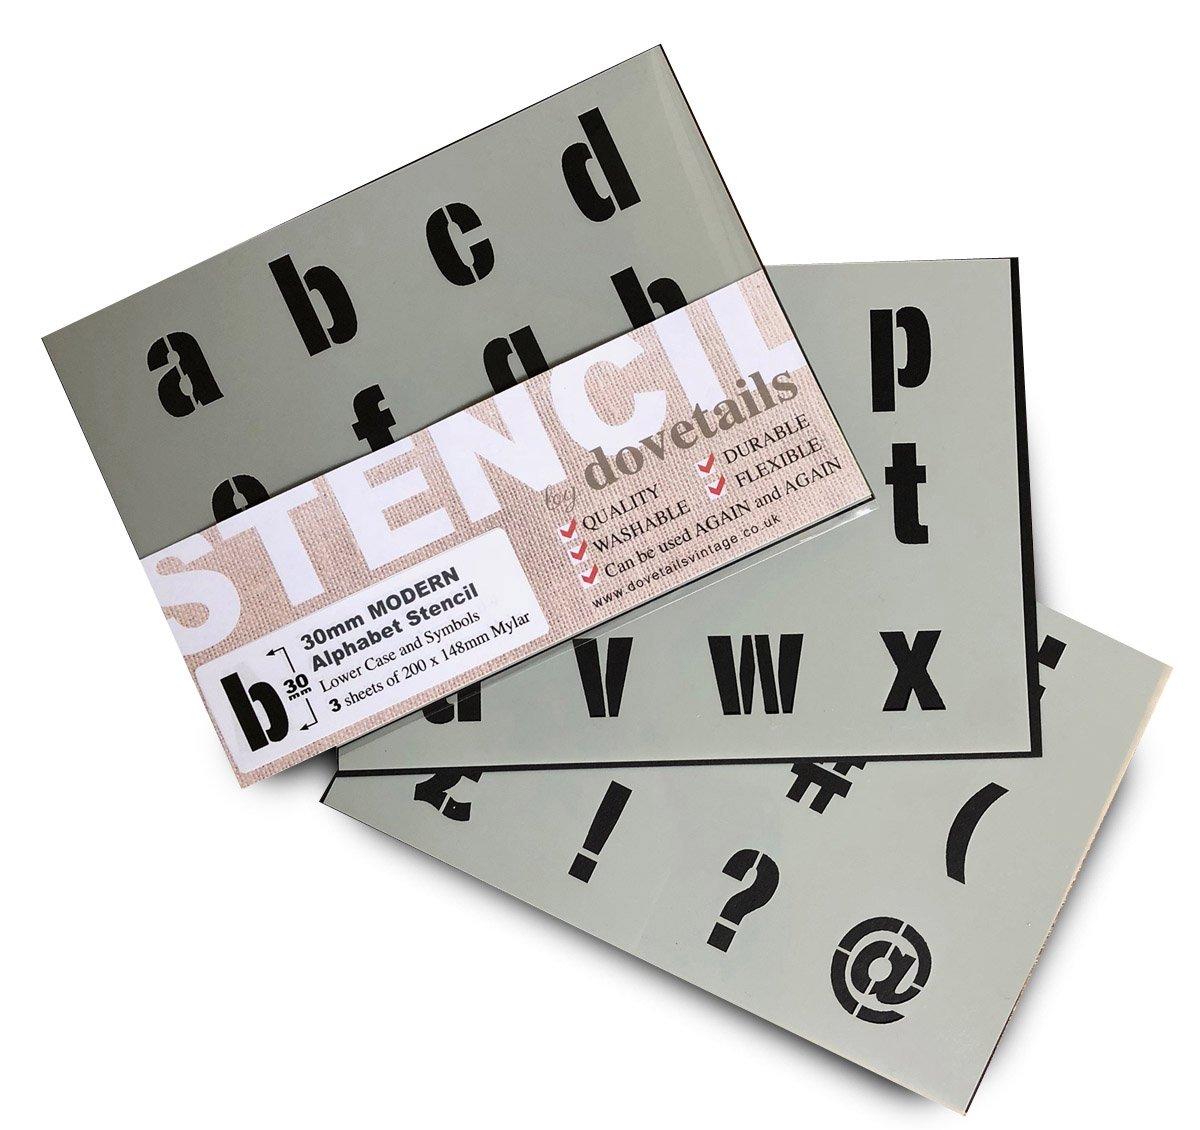 Alphabet Stencil Letter 30mm Tall Plus Symbols (1.18